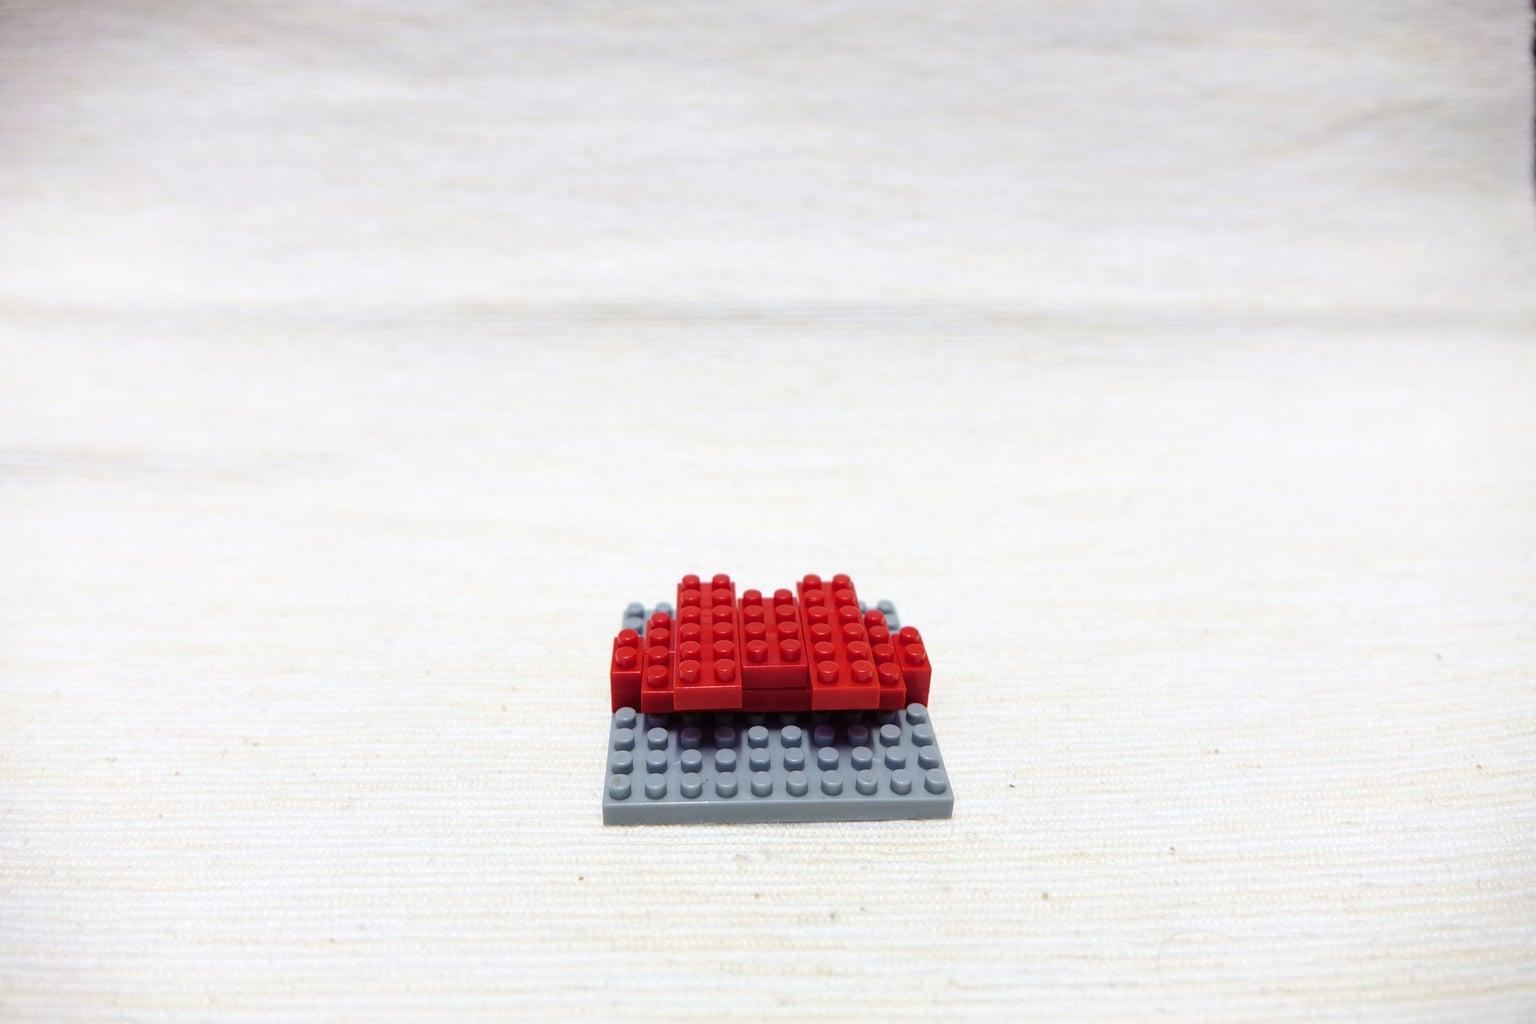 Red Block 2*6, 2*6